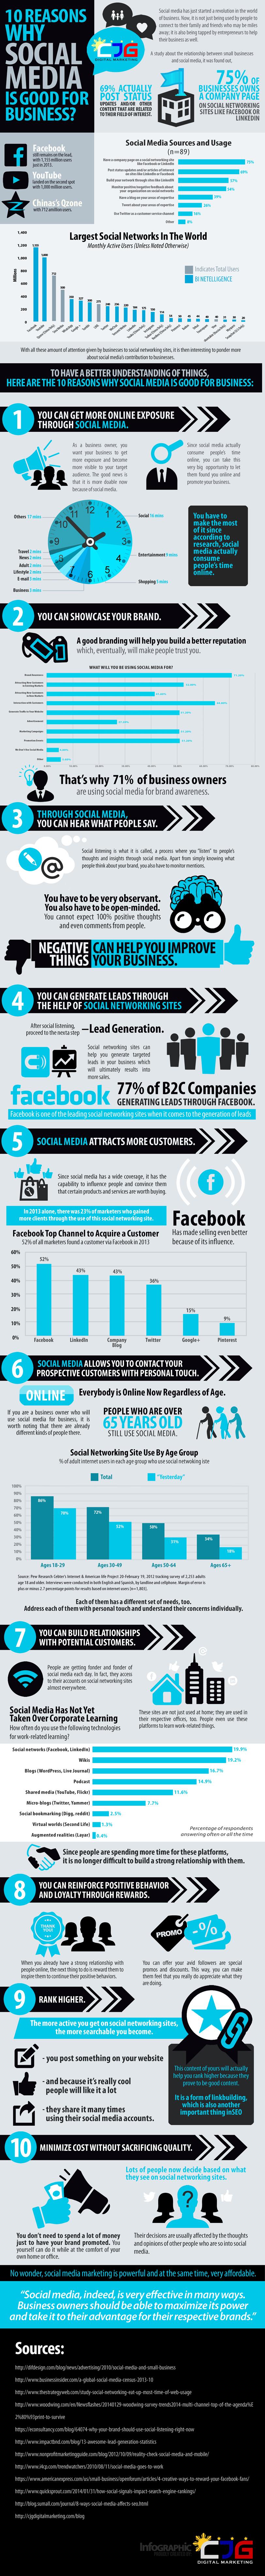 10-reasons-social-media-business